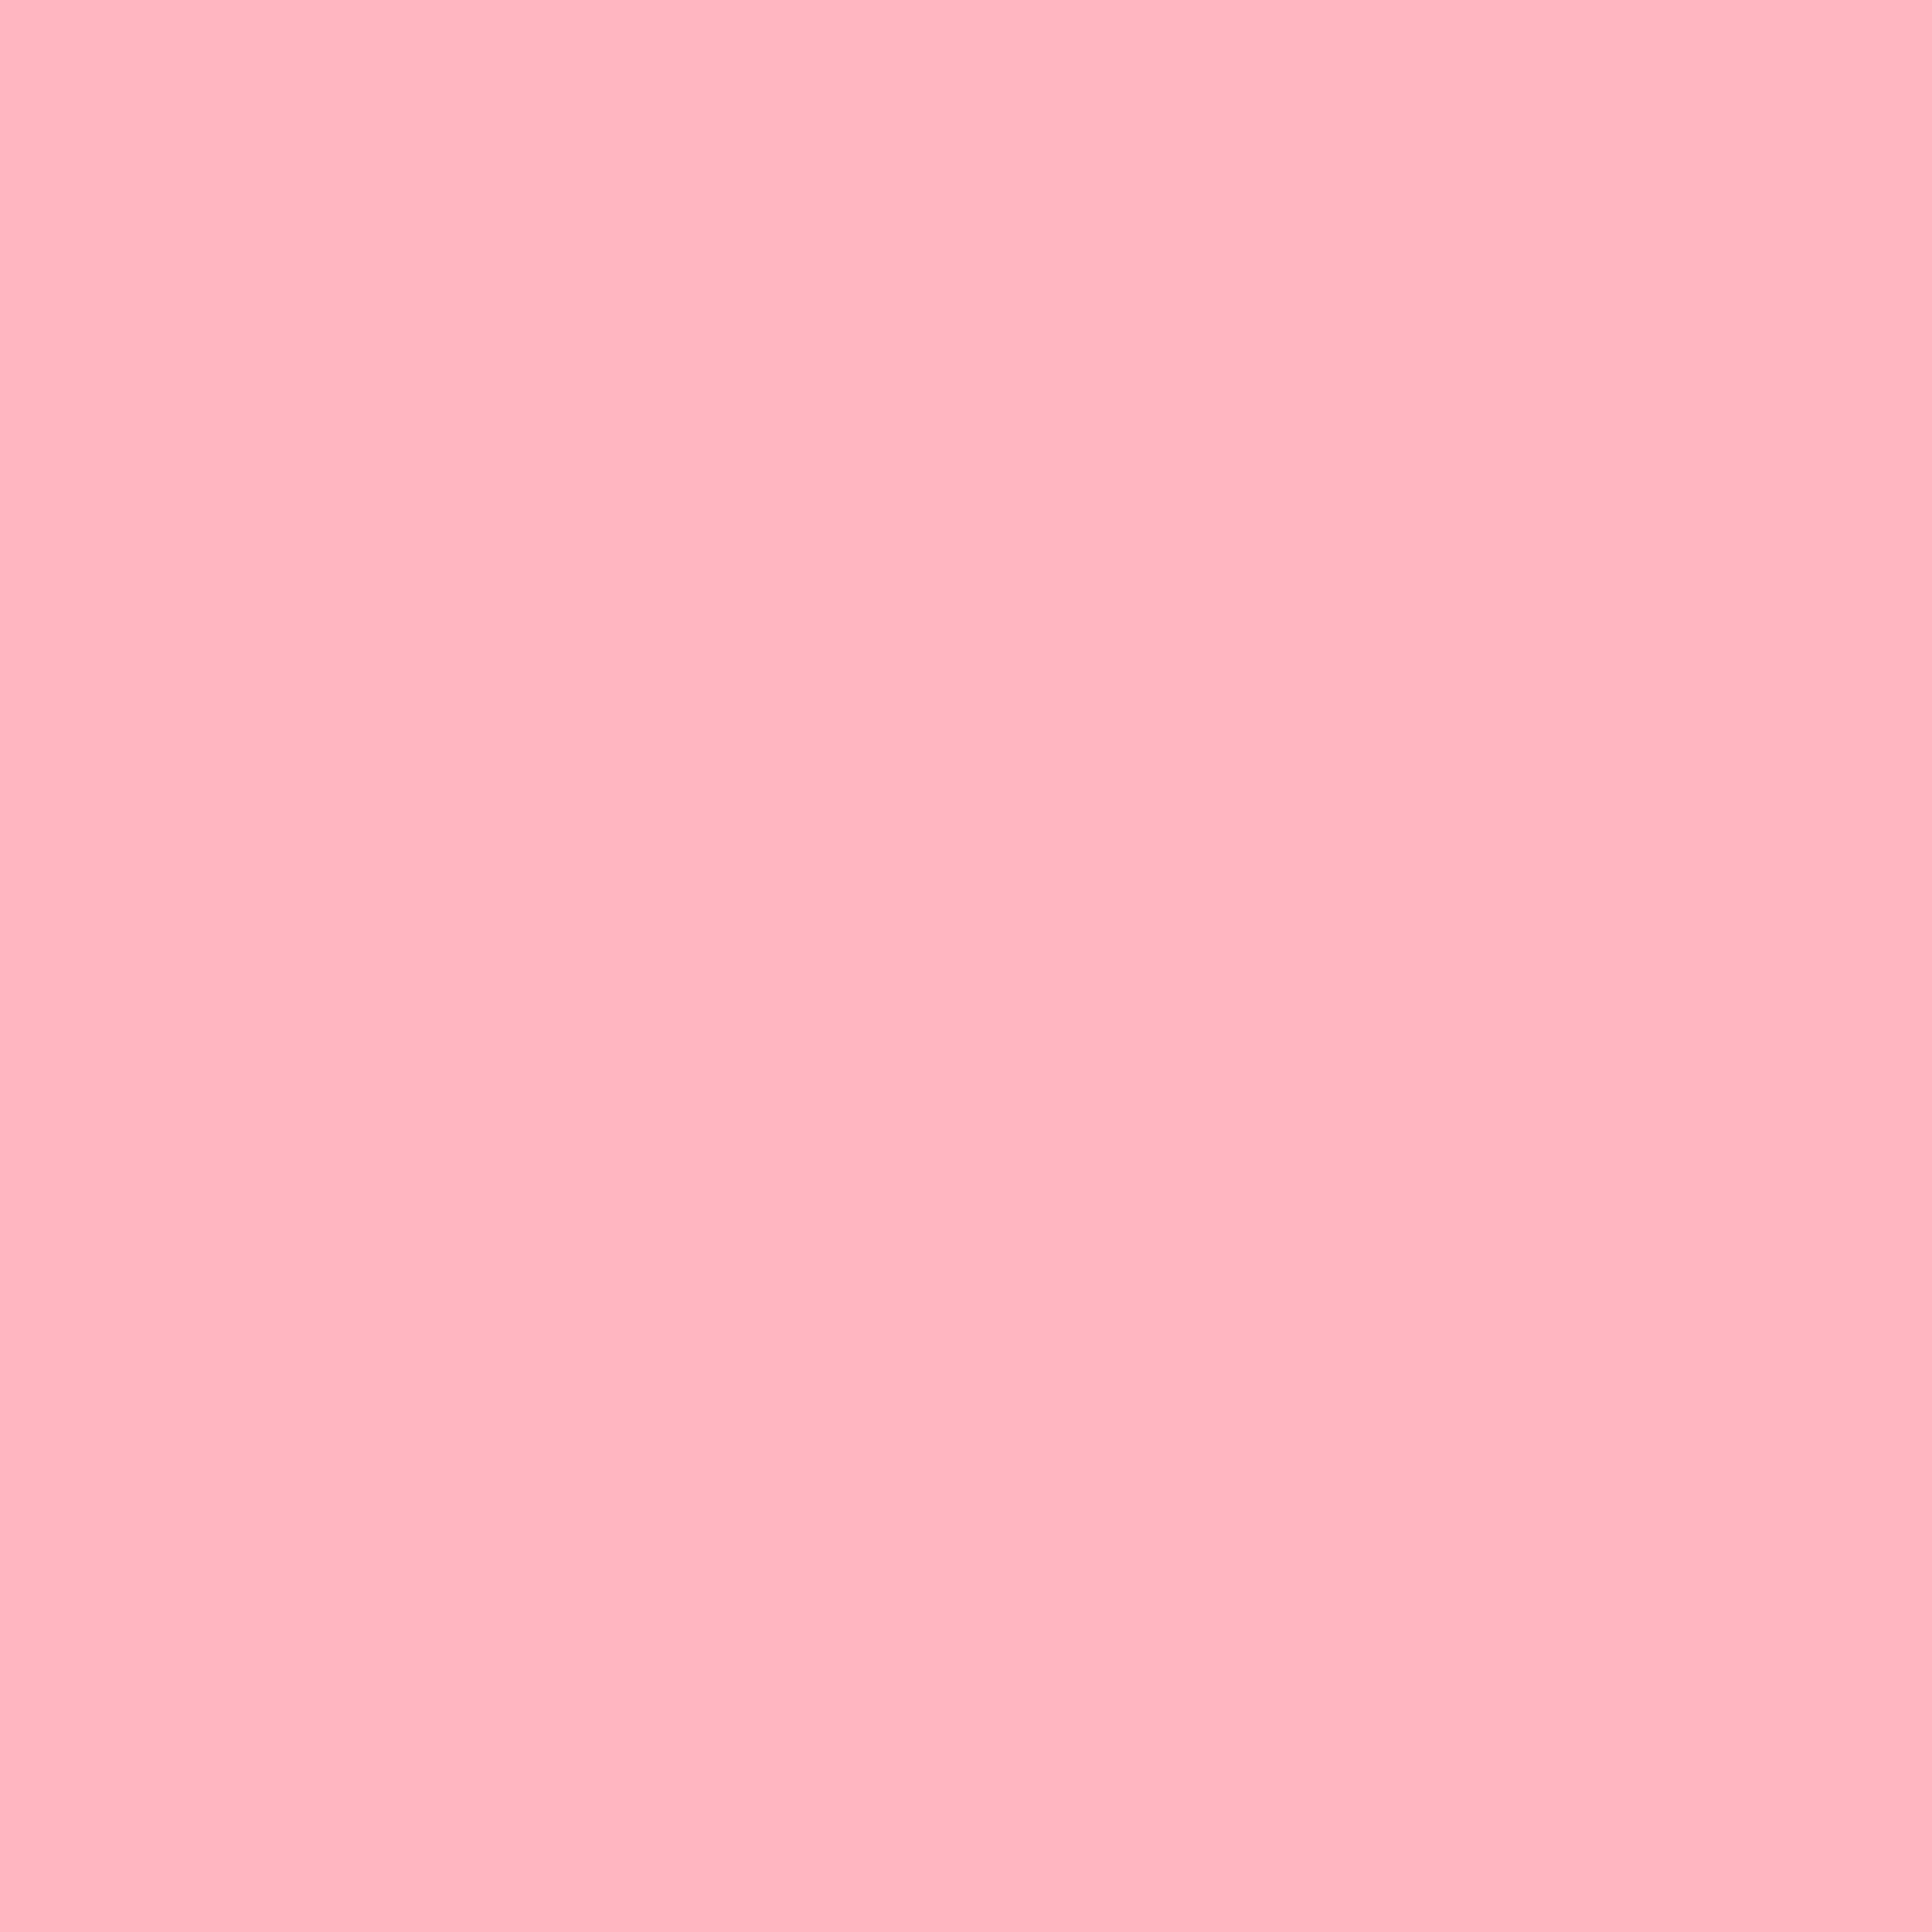 Light Pink Wallpaper Wallpapersafari   Data Src Soft - Lilac - HD Wallpaper